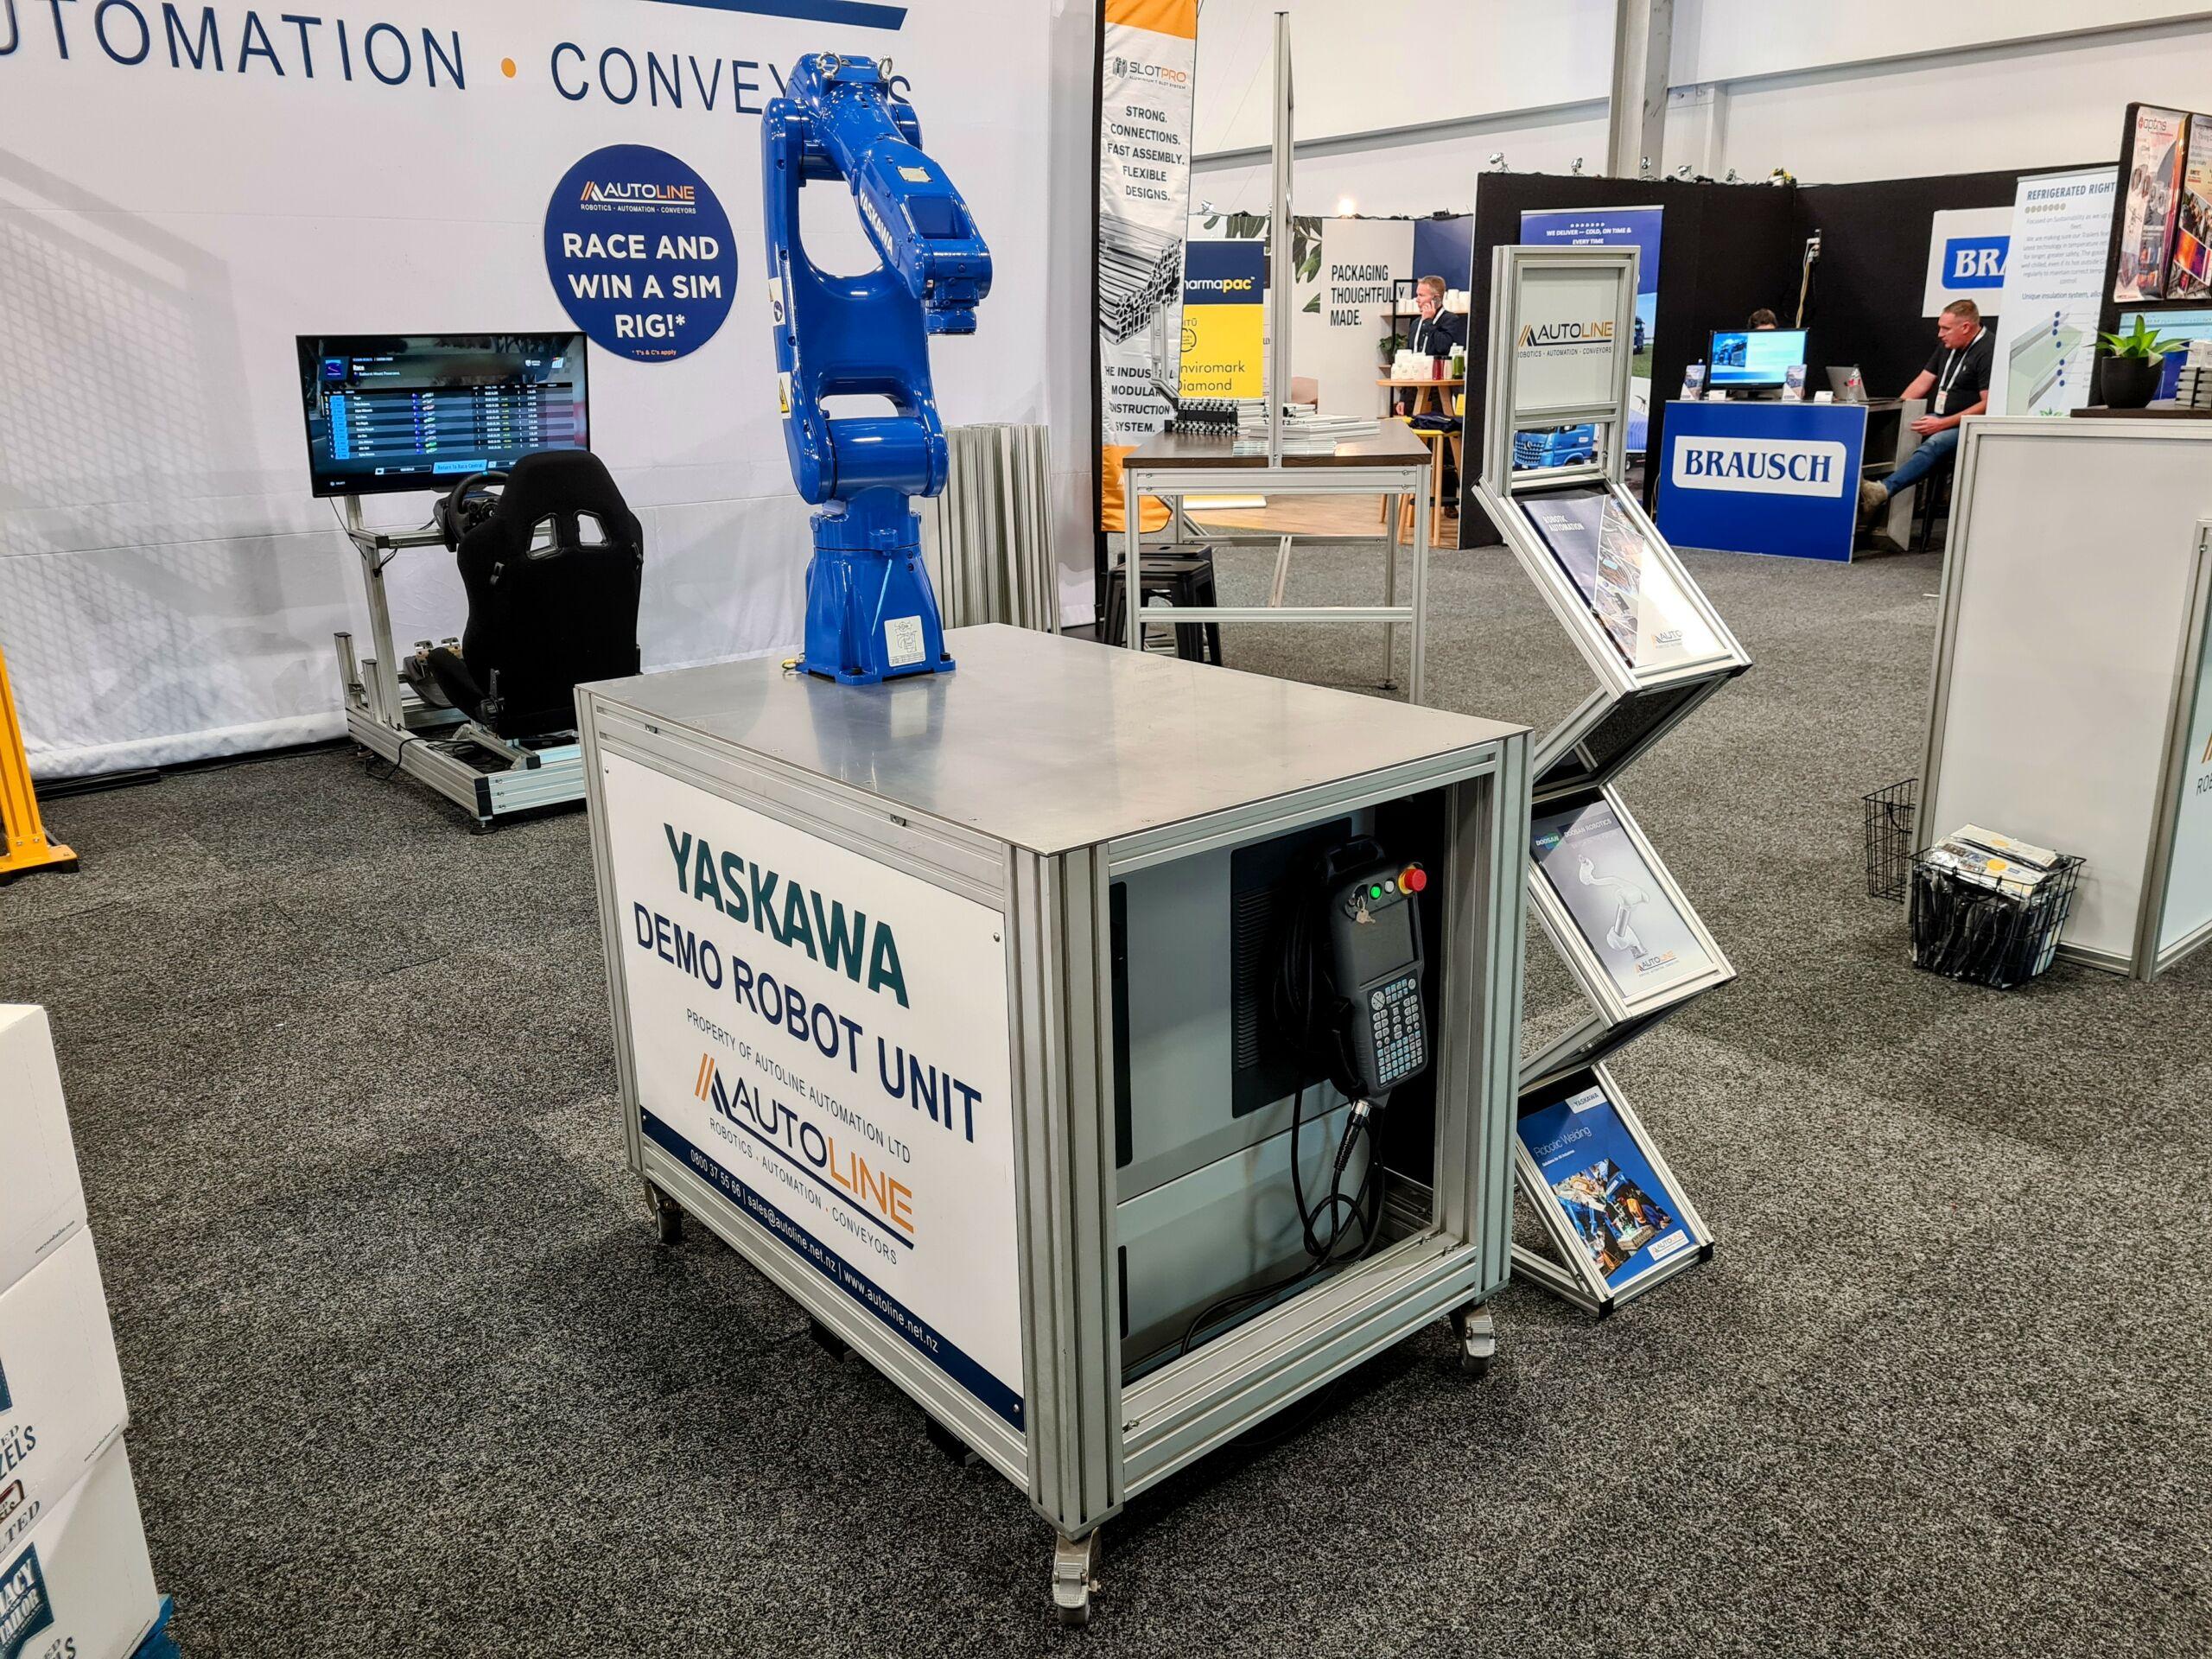 Yaskawa demo robot unit   Autoline